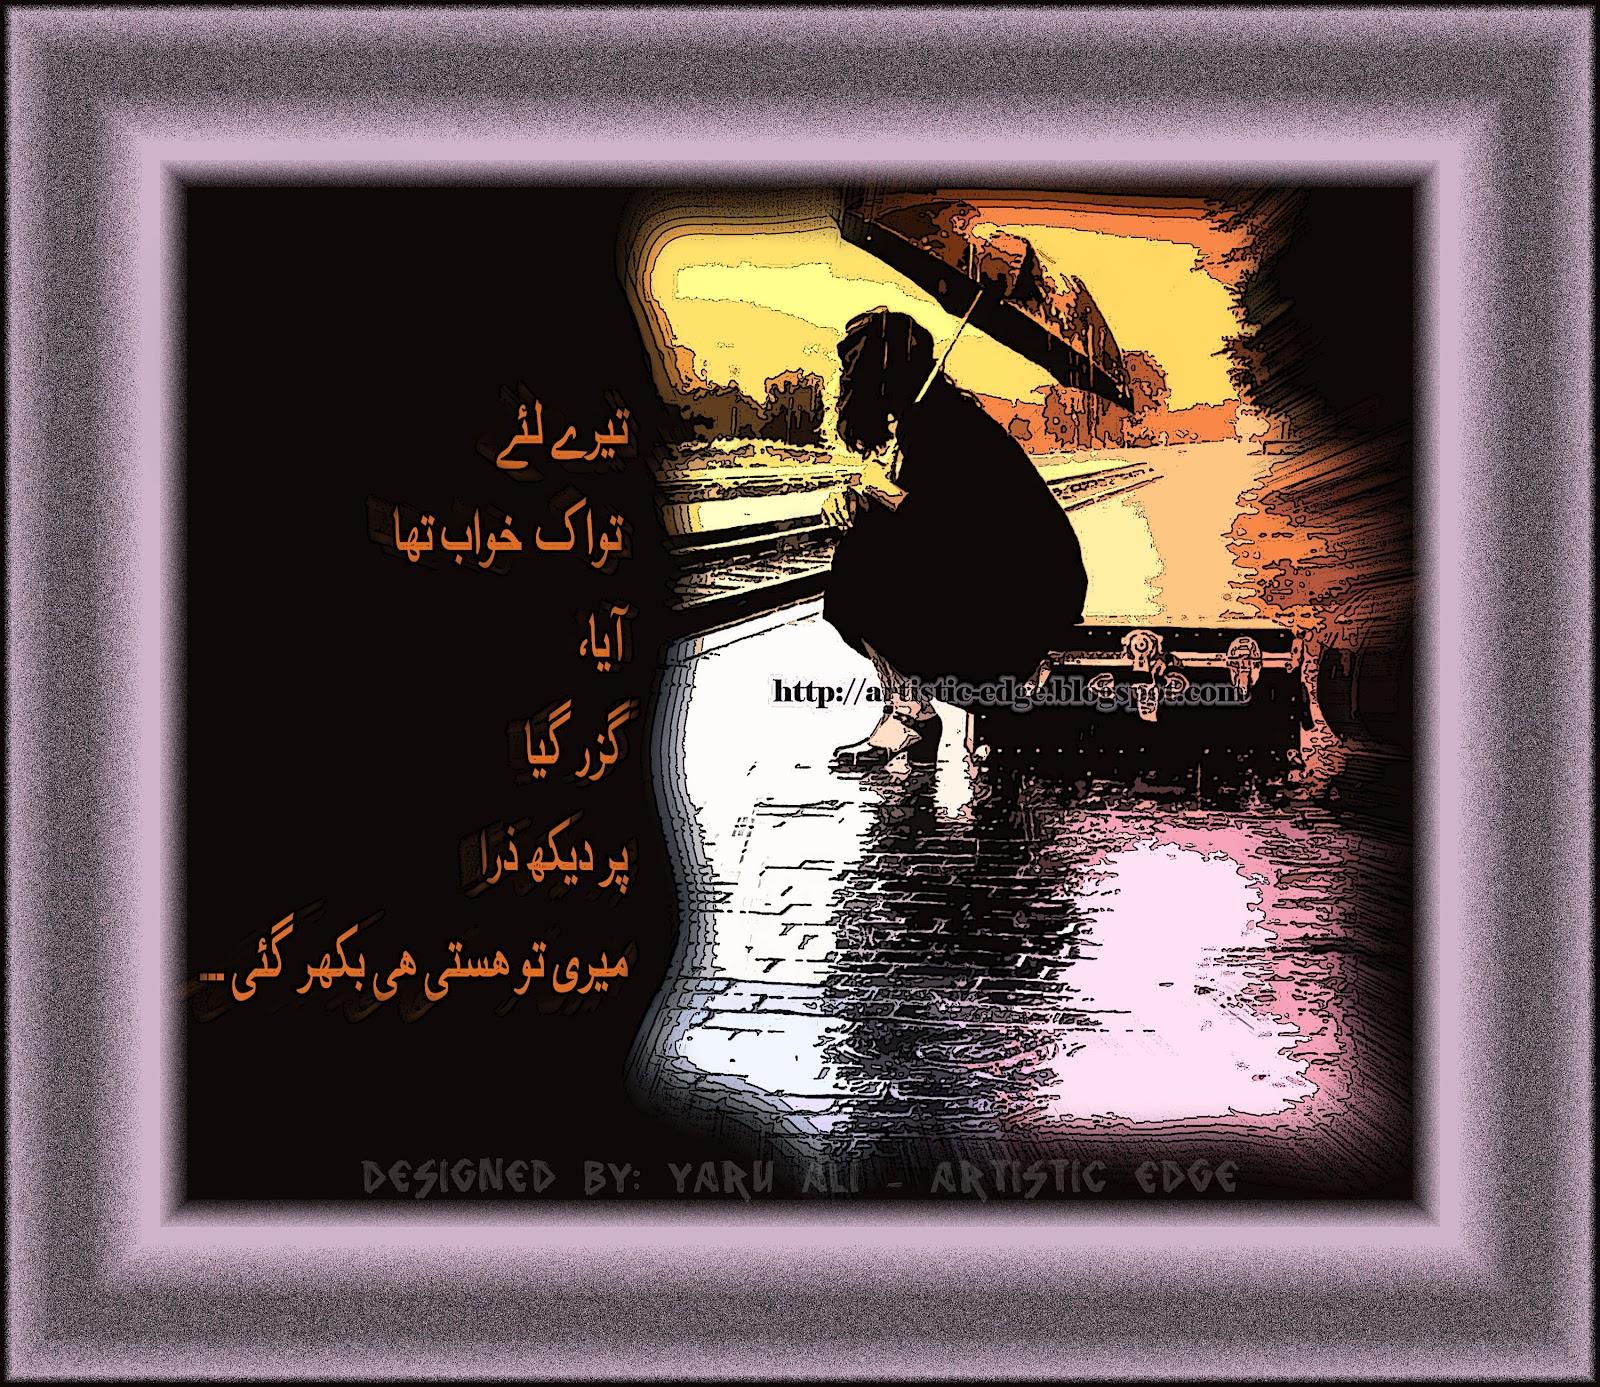 Wallpaper Urdu Writing